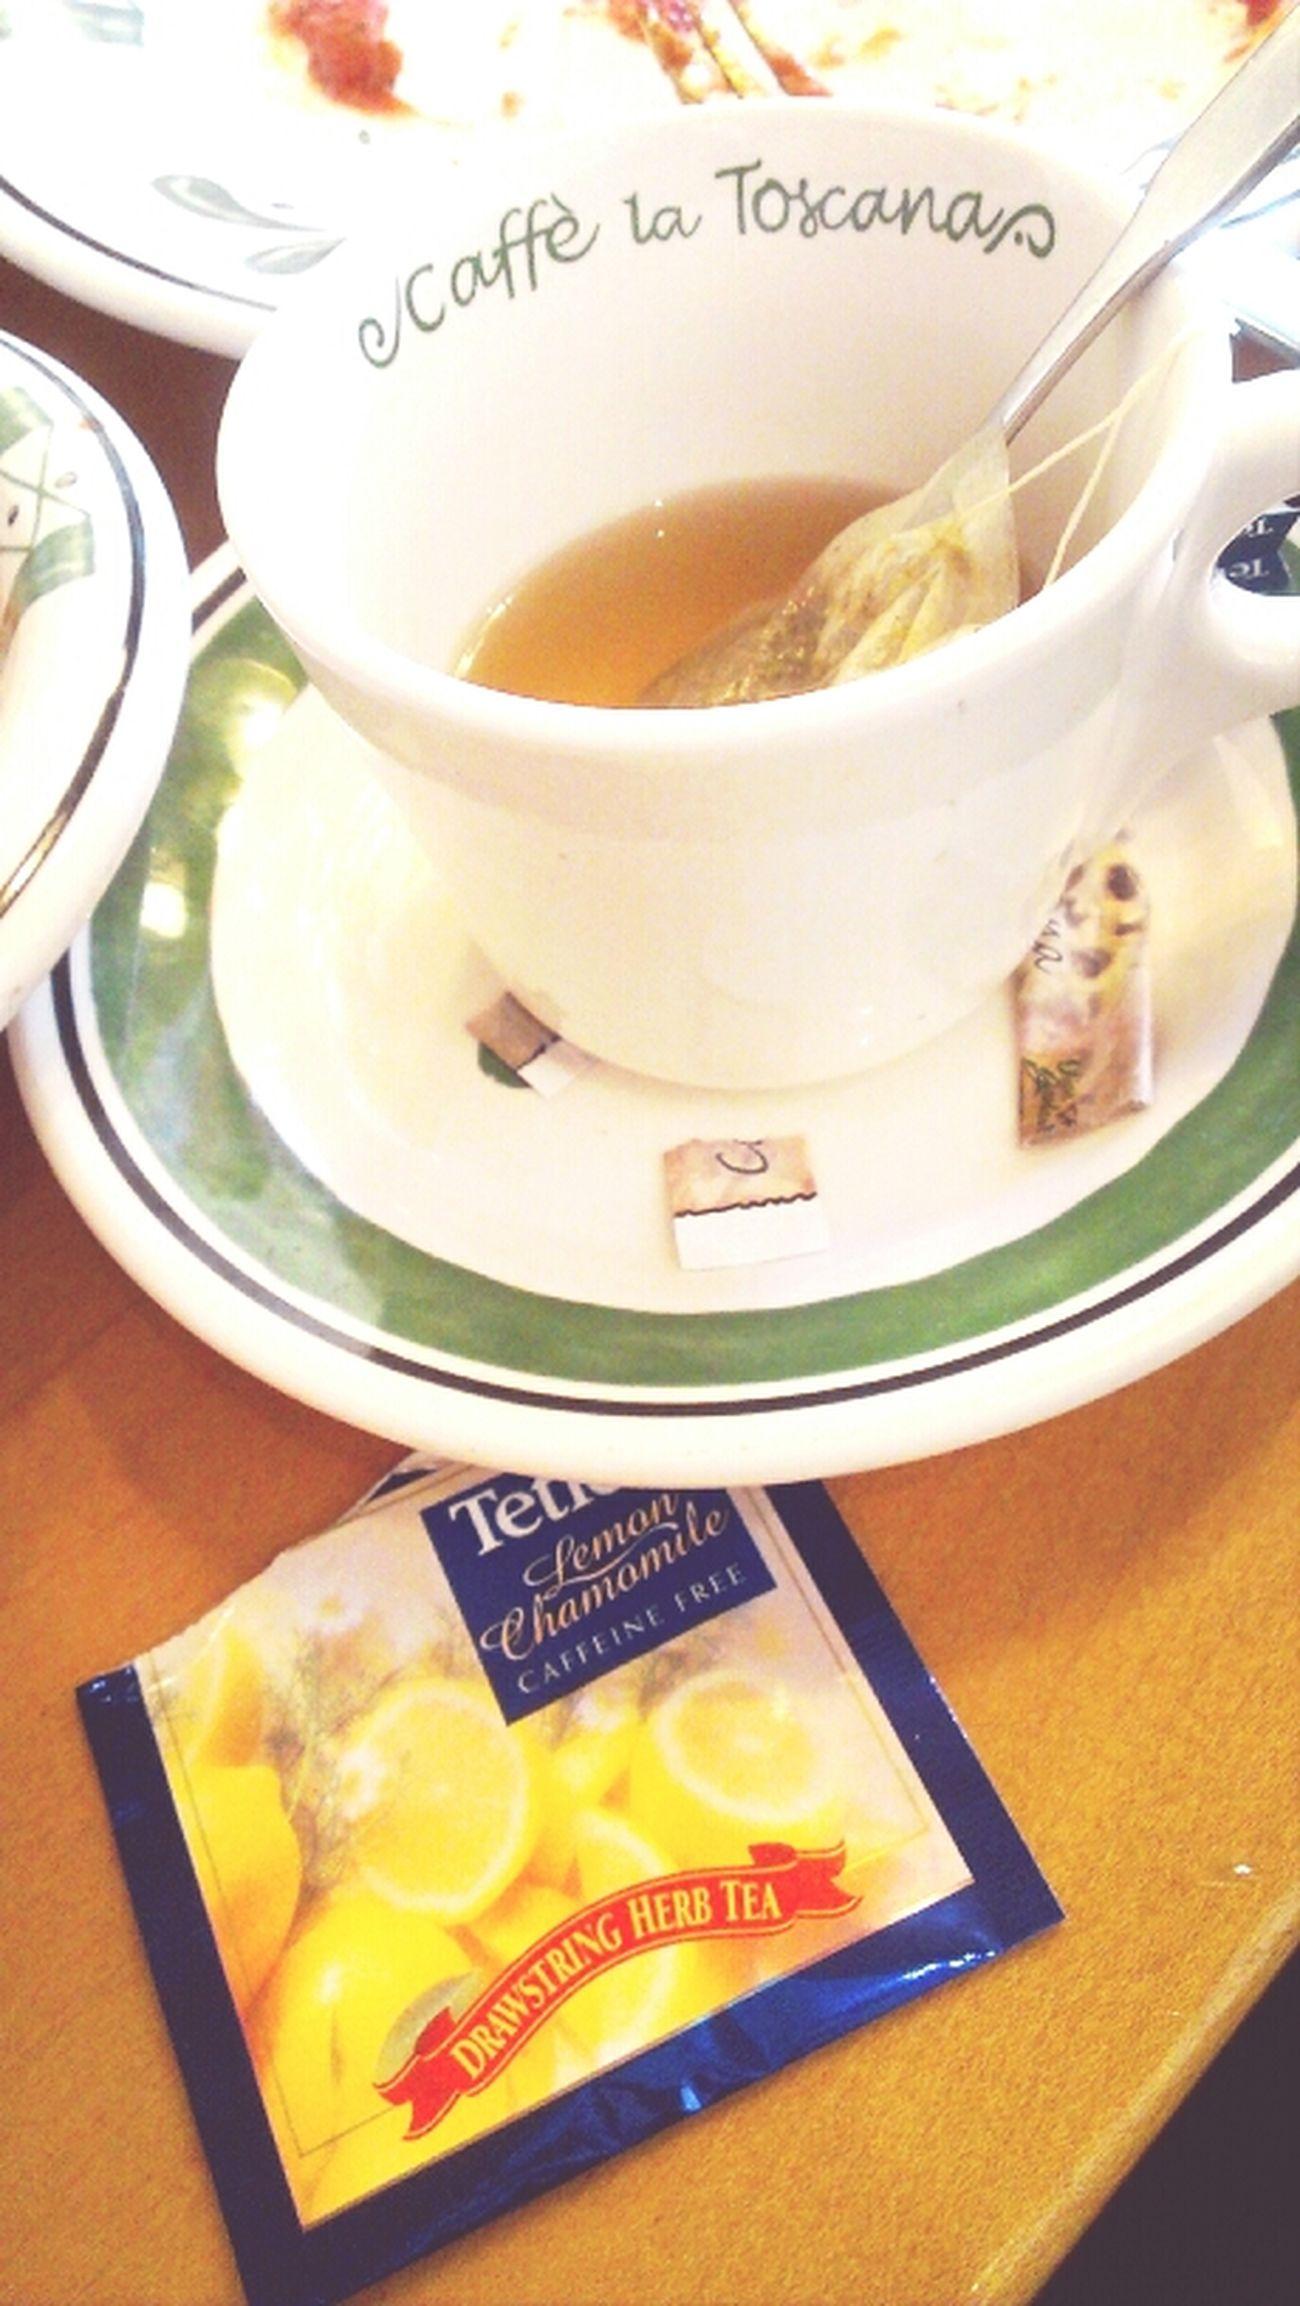 I'd rather drink tea than anything else ^.^